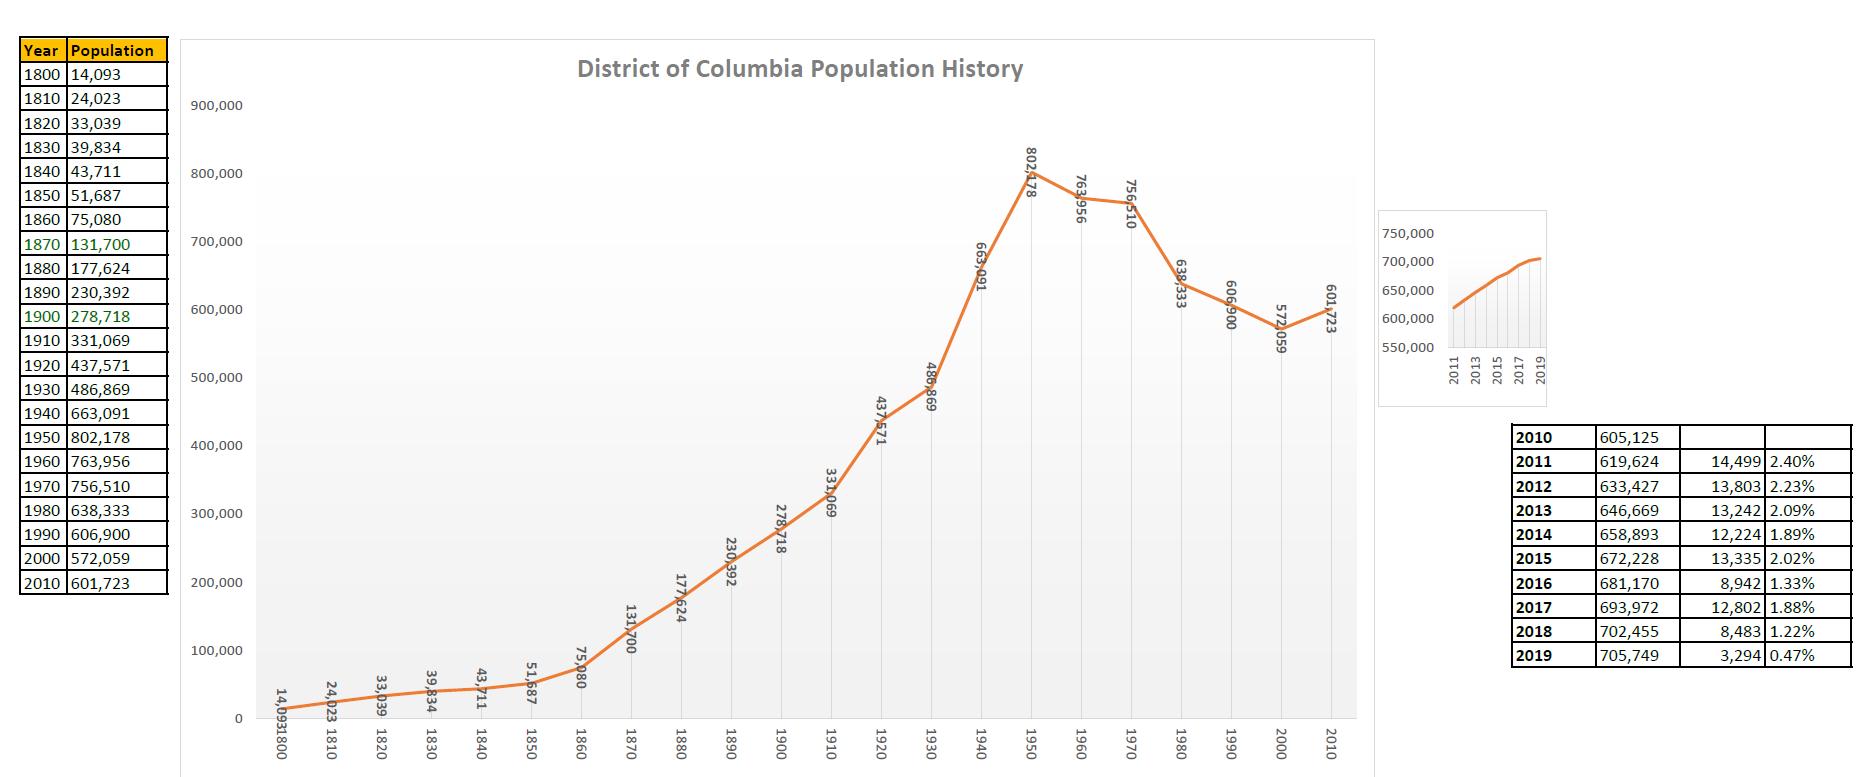 DCpopulation history2019.jpg